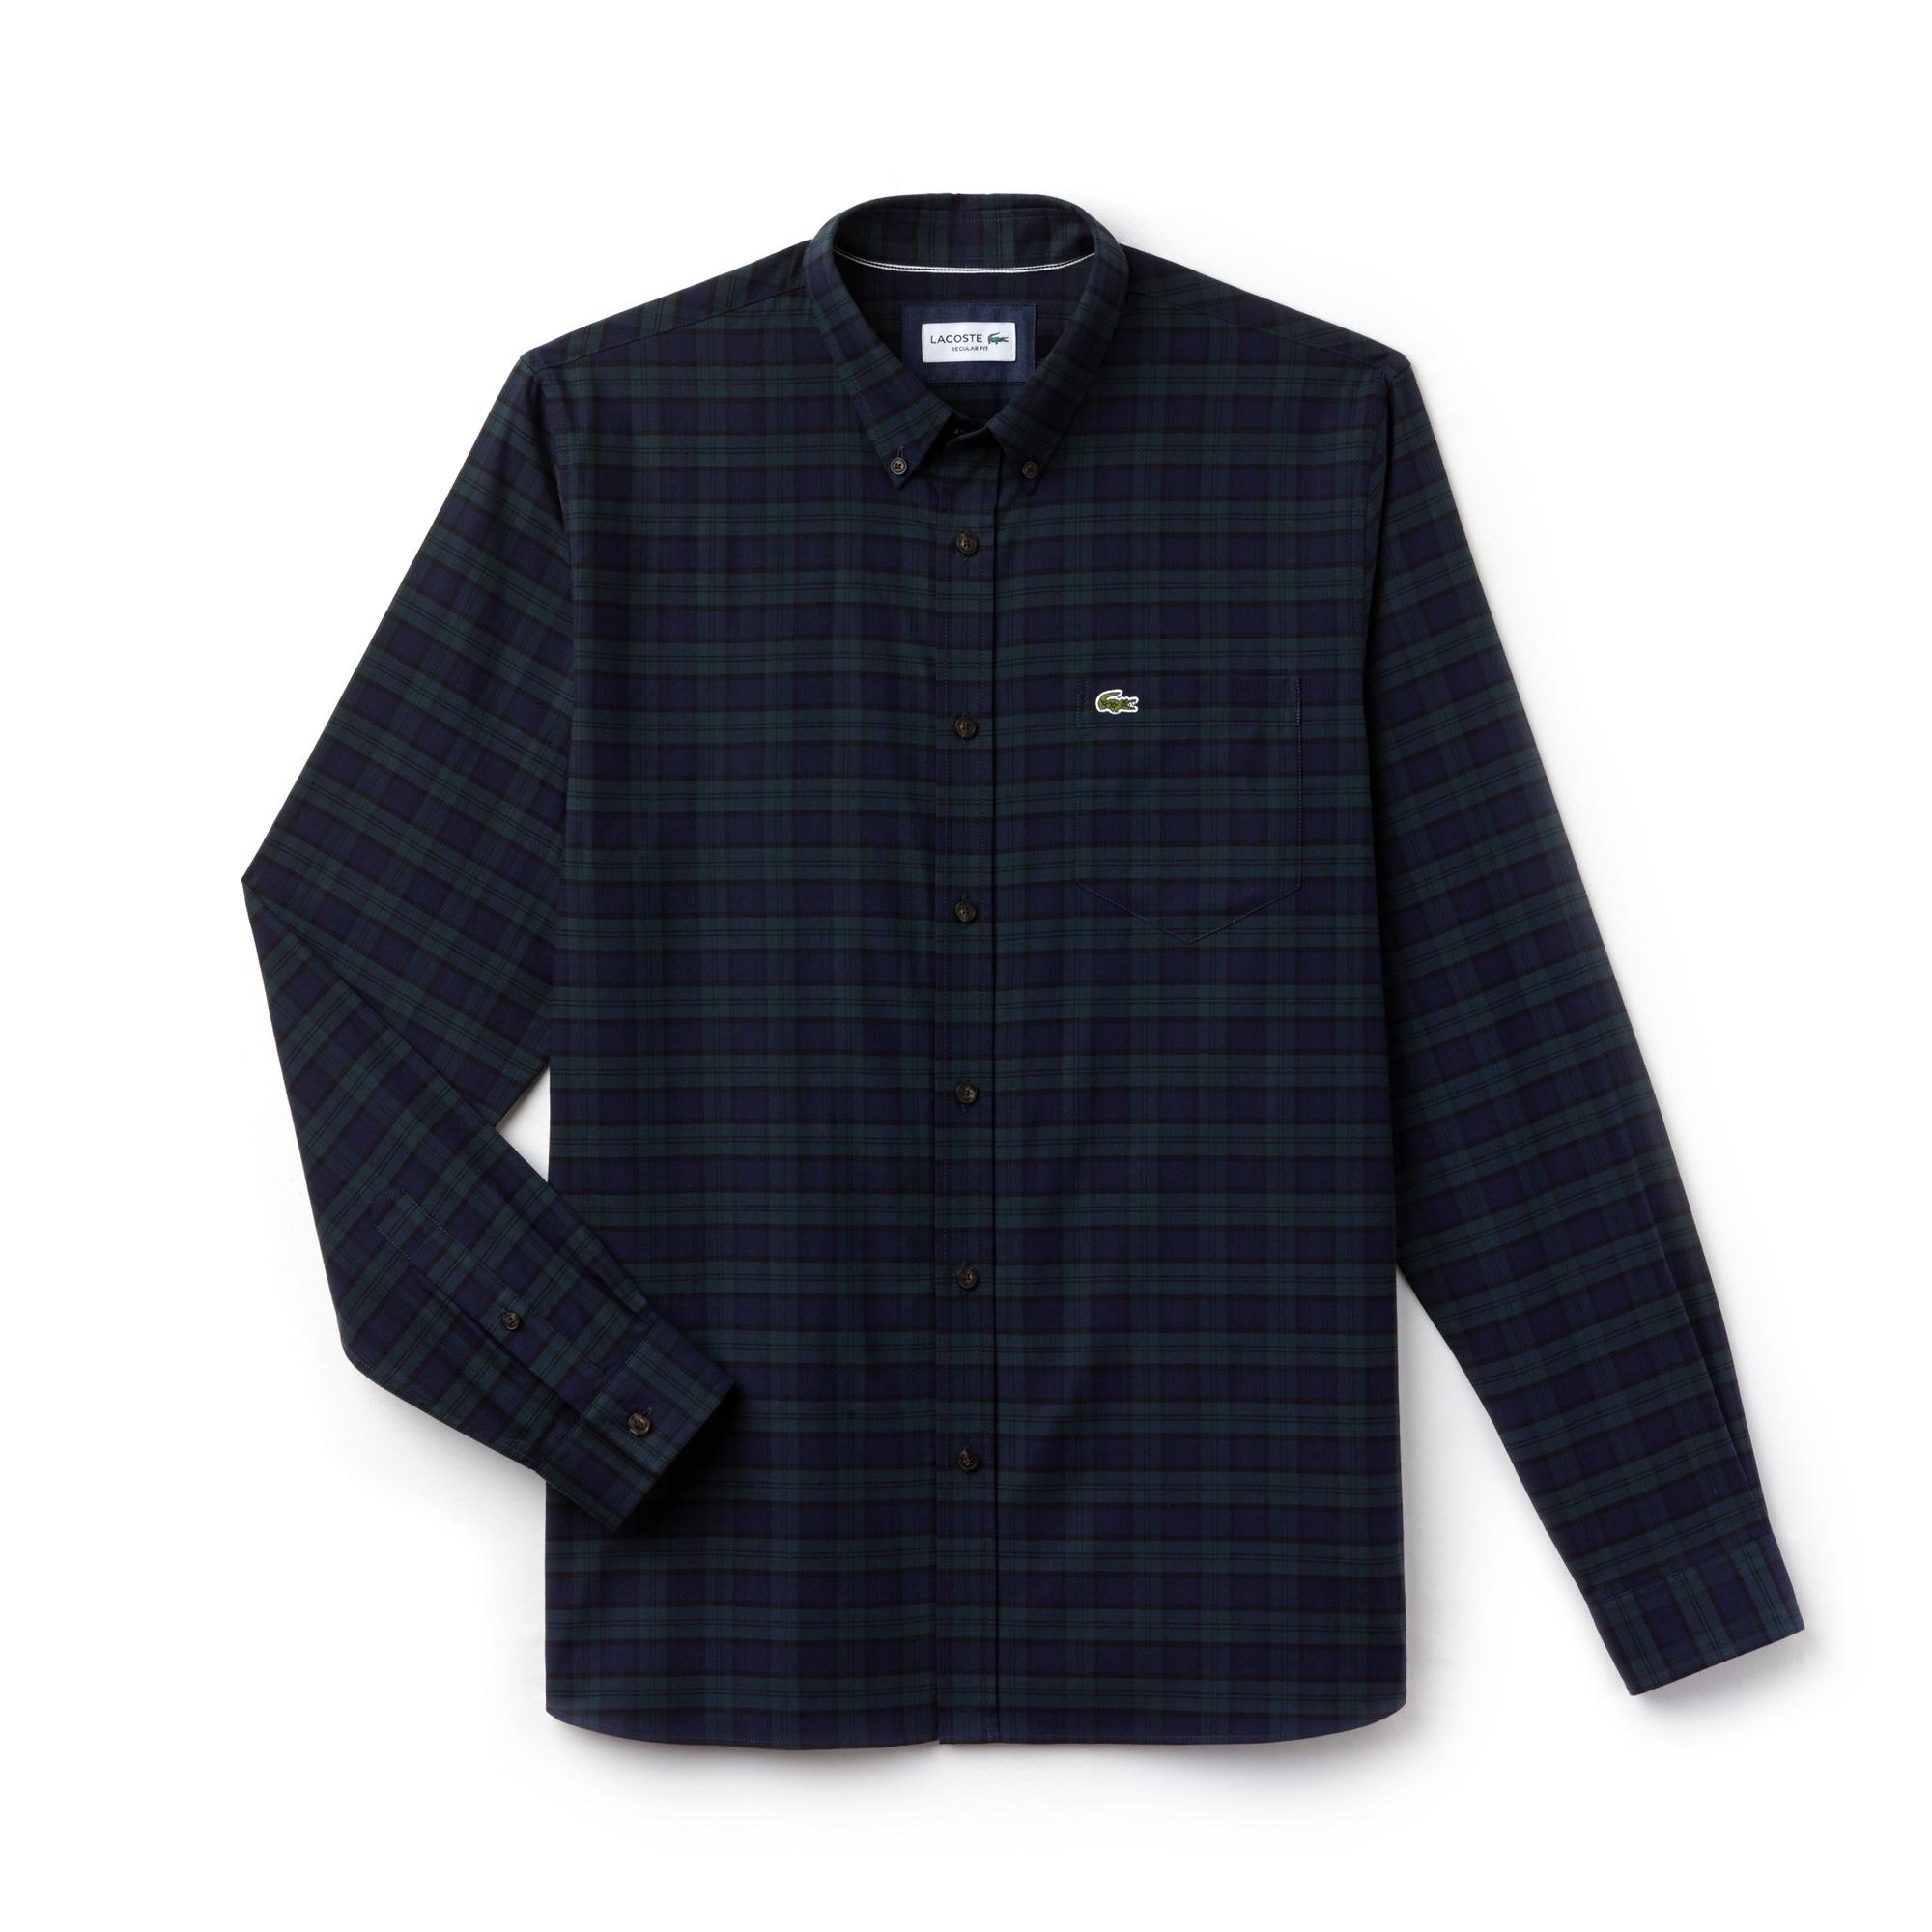 Рубашка Lacoste за 8 980 руб. купить в интернет-магазине 5e0b00f6e5e